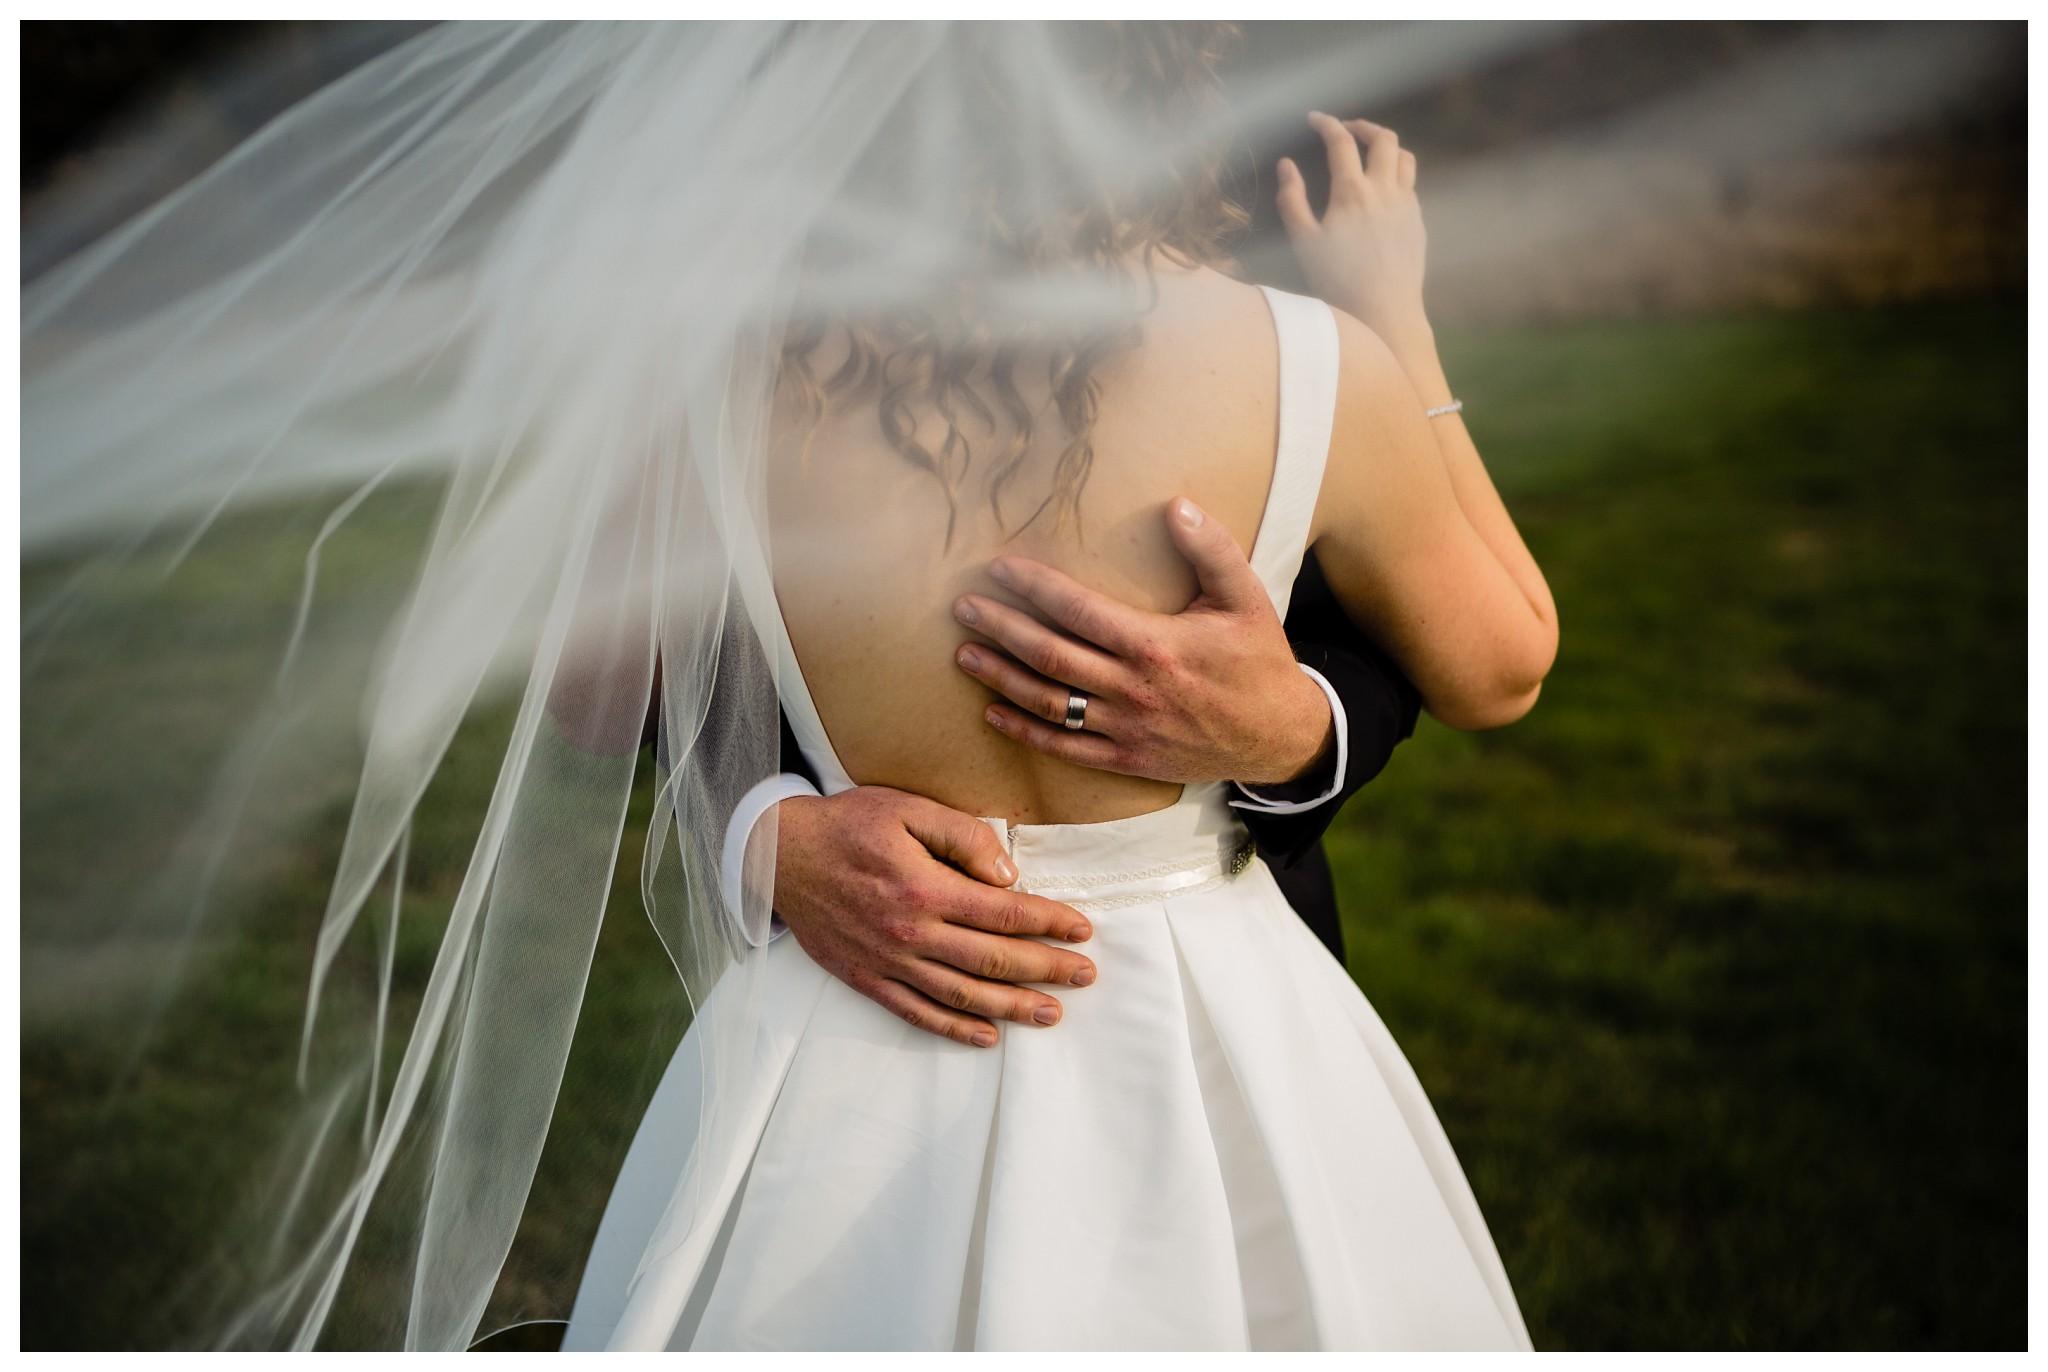 Aldergrove Park Christian Church Wedding Photography Pink Flowers Blue Bridesmaid Dress Fall_0115.jpg